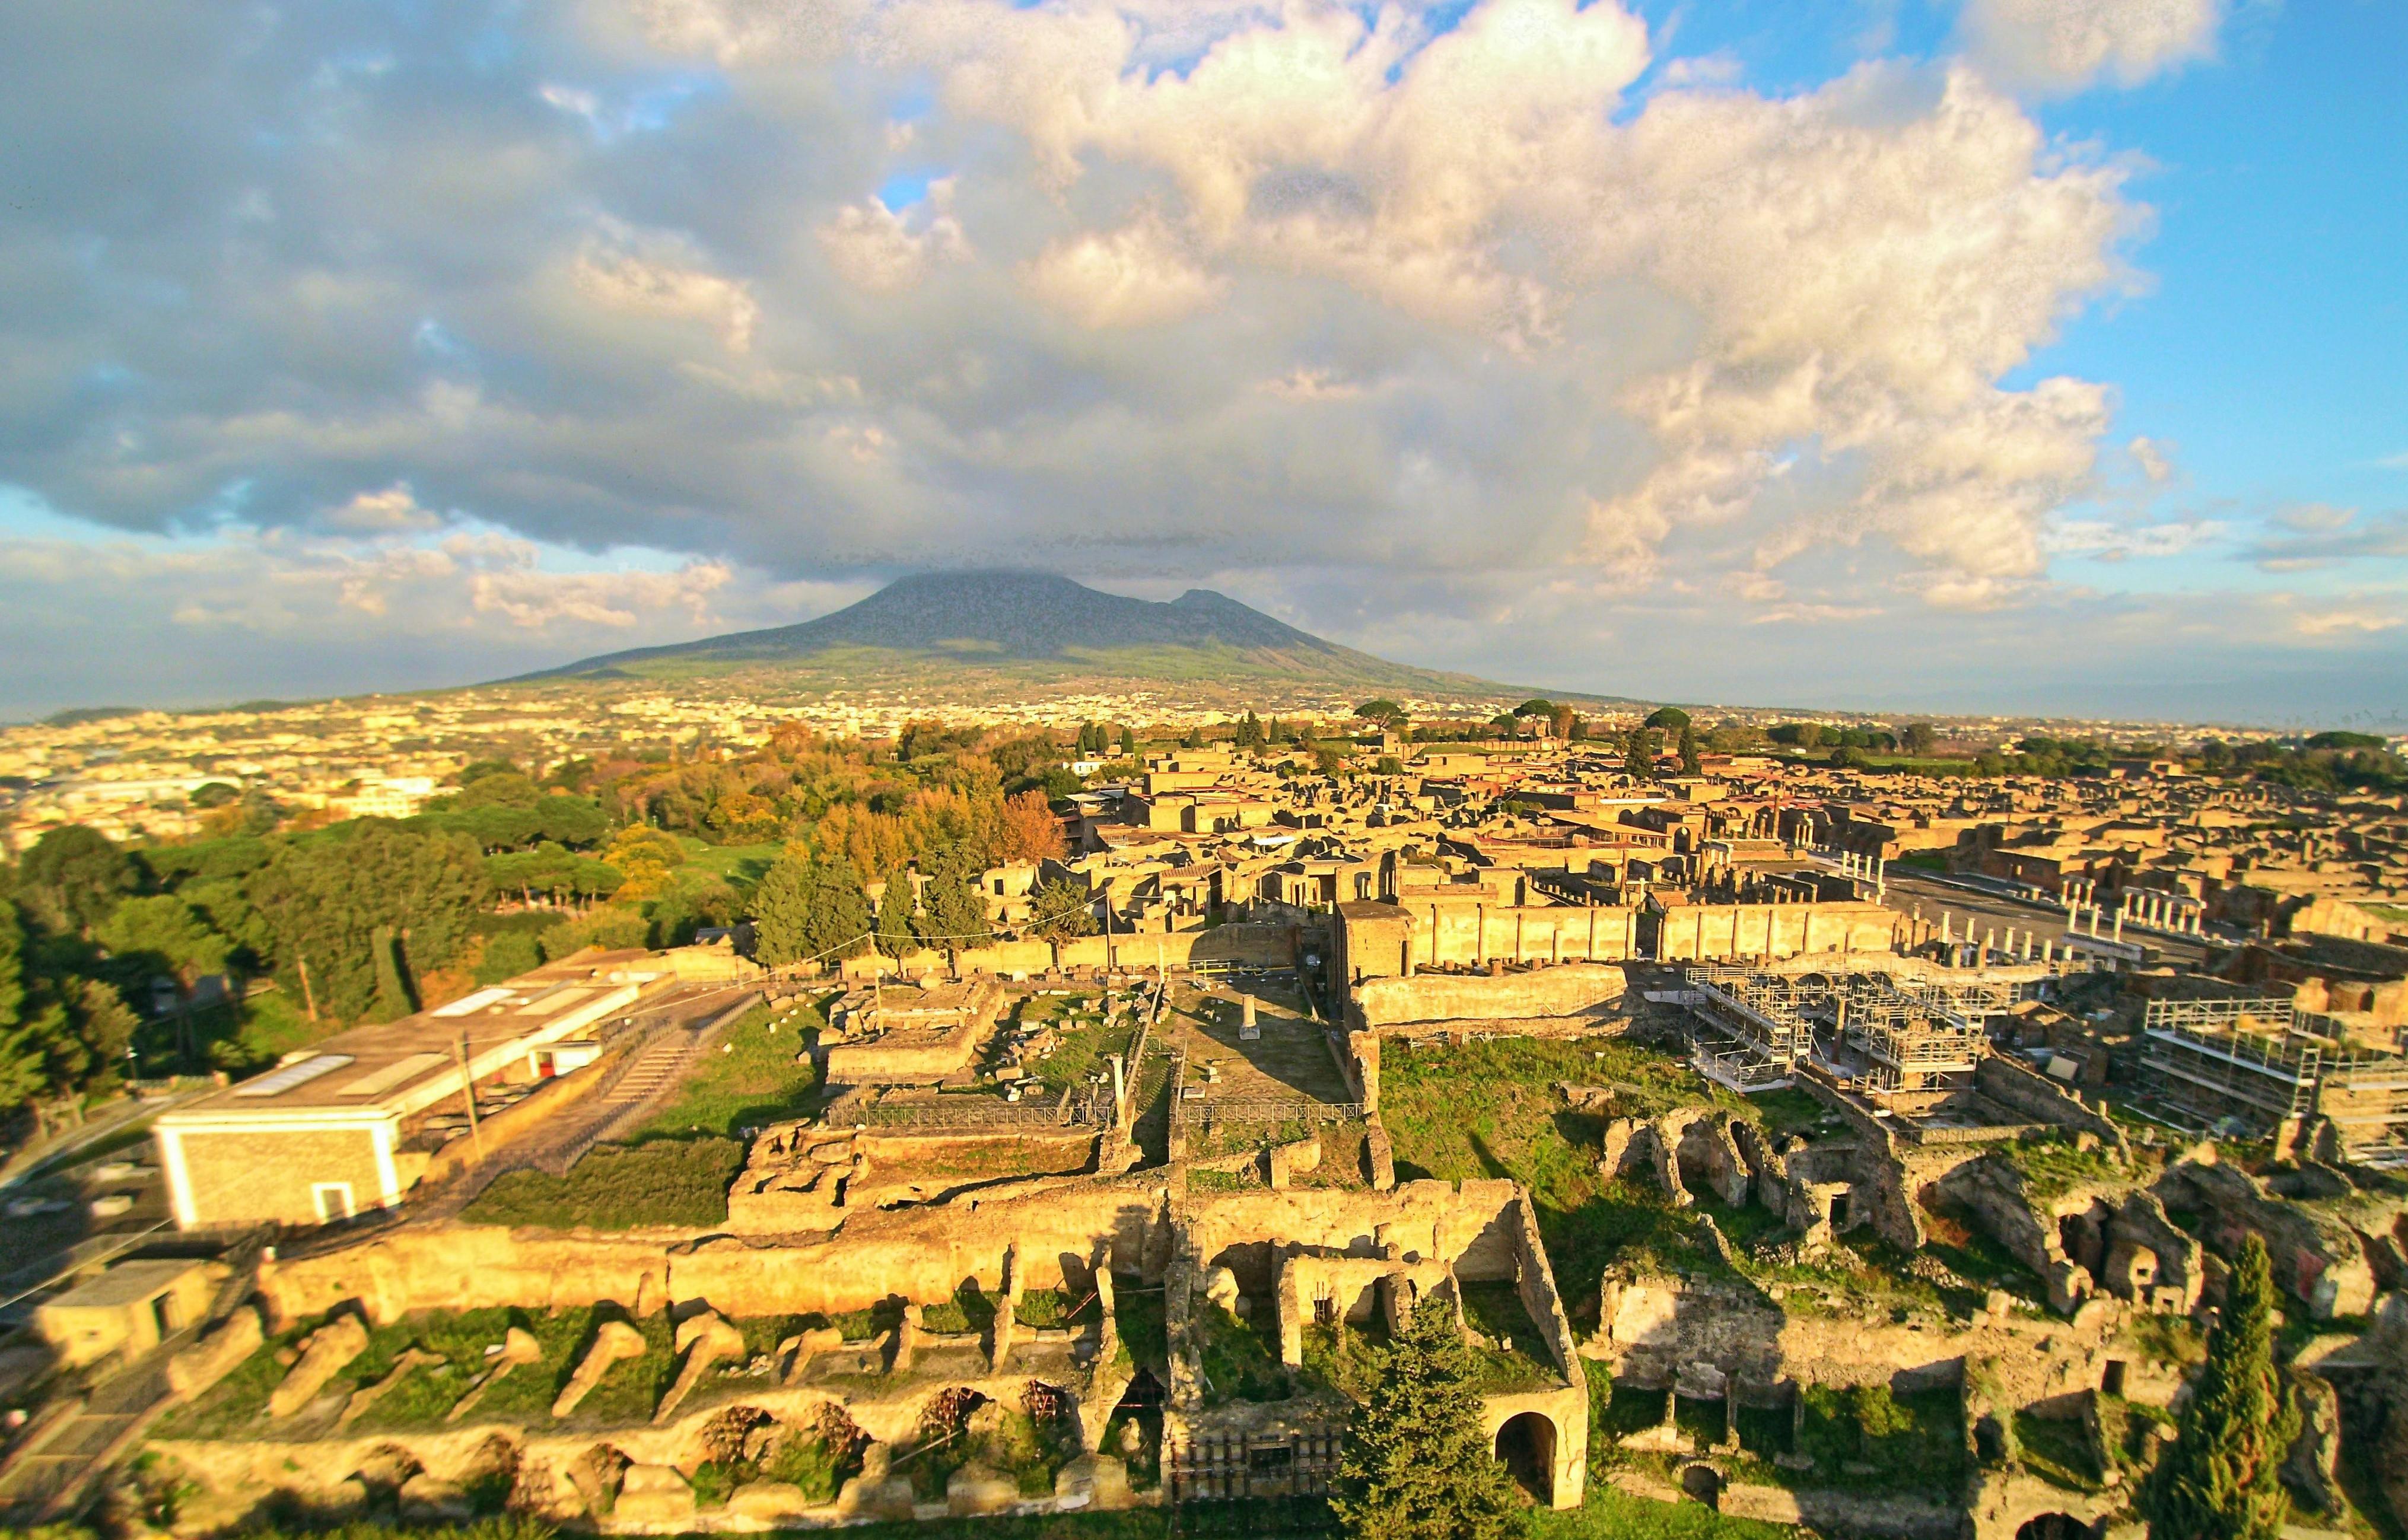 File:Italy-pompeii.jpg